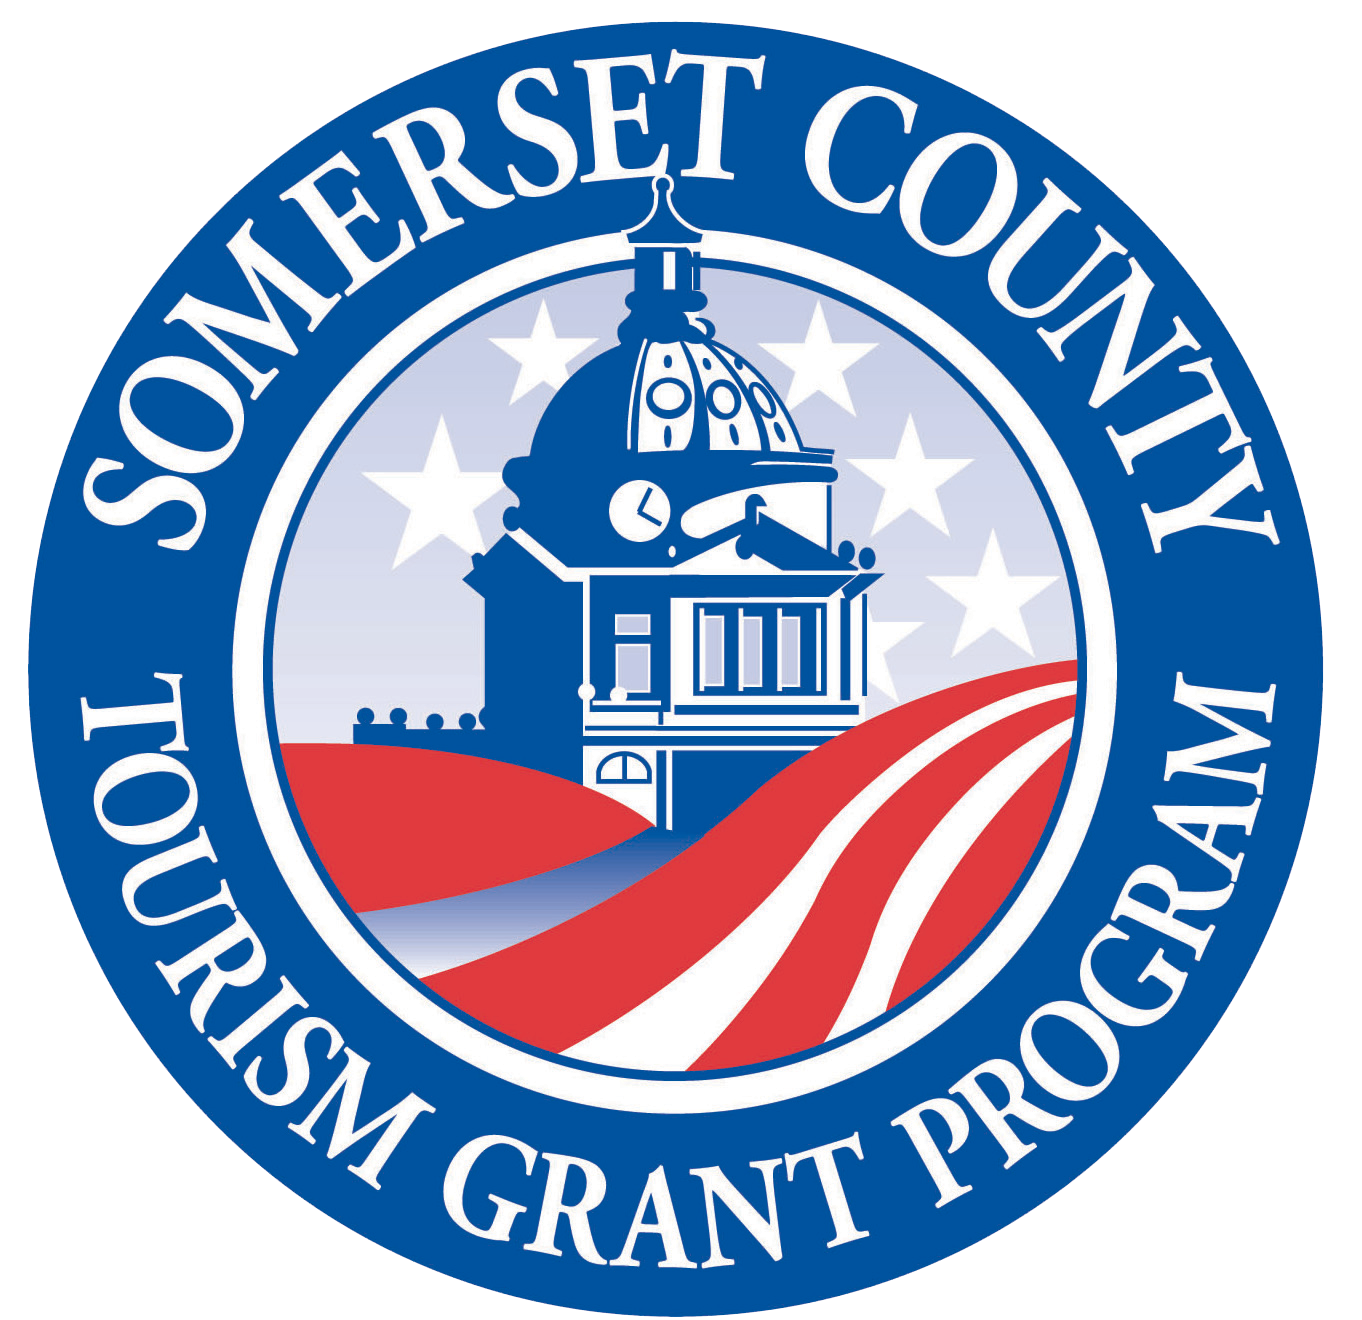 Somerset County Tourism Grant Program